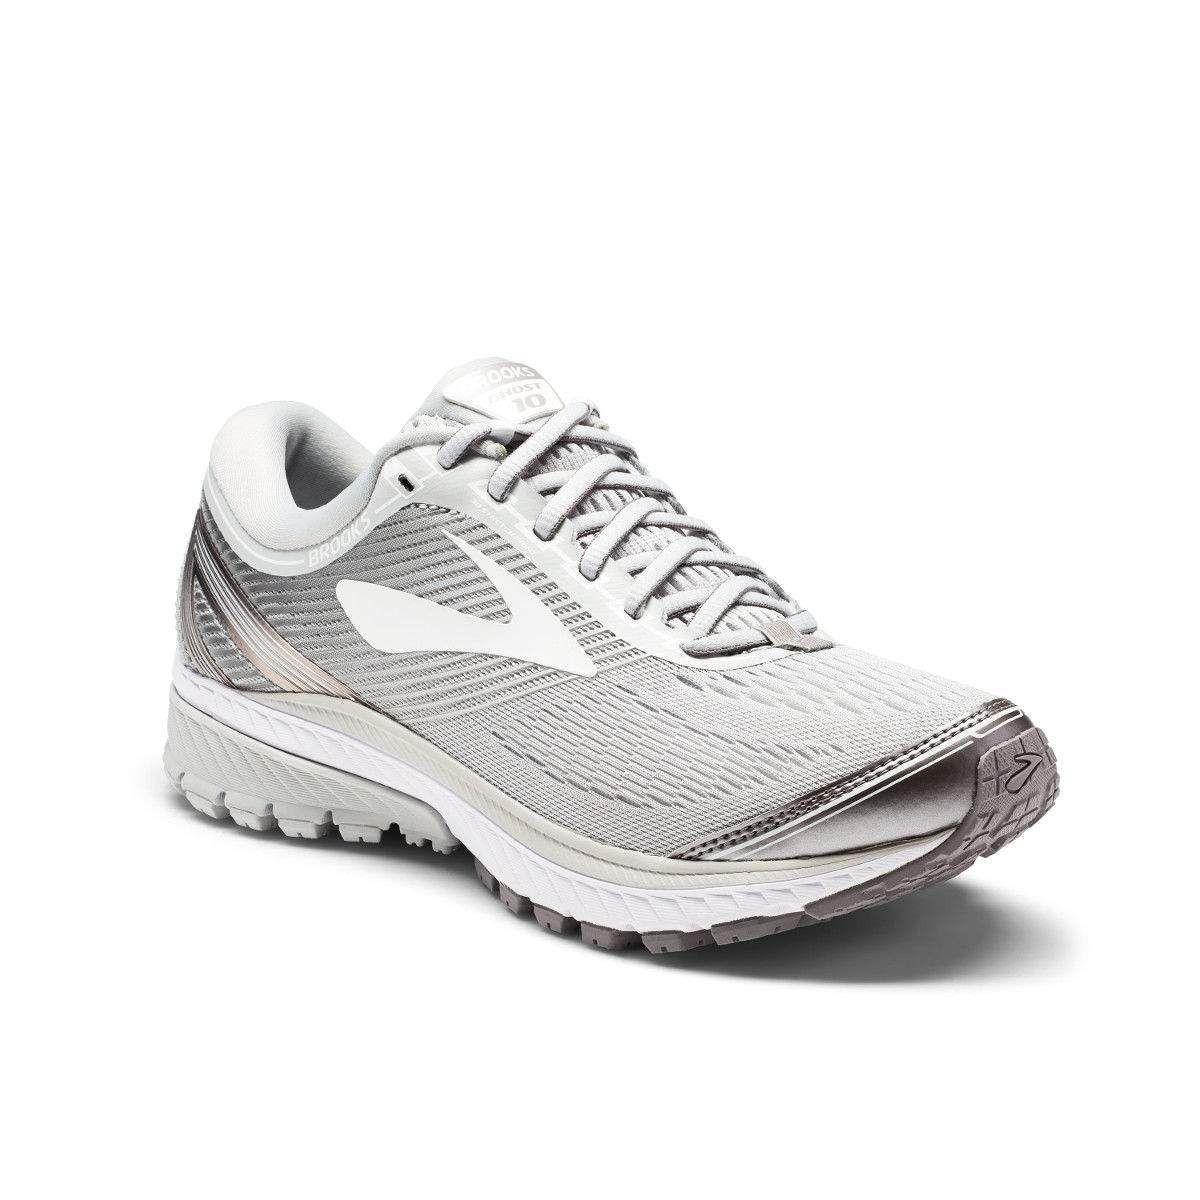 Brooks running shoes women